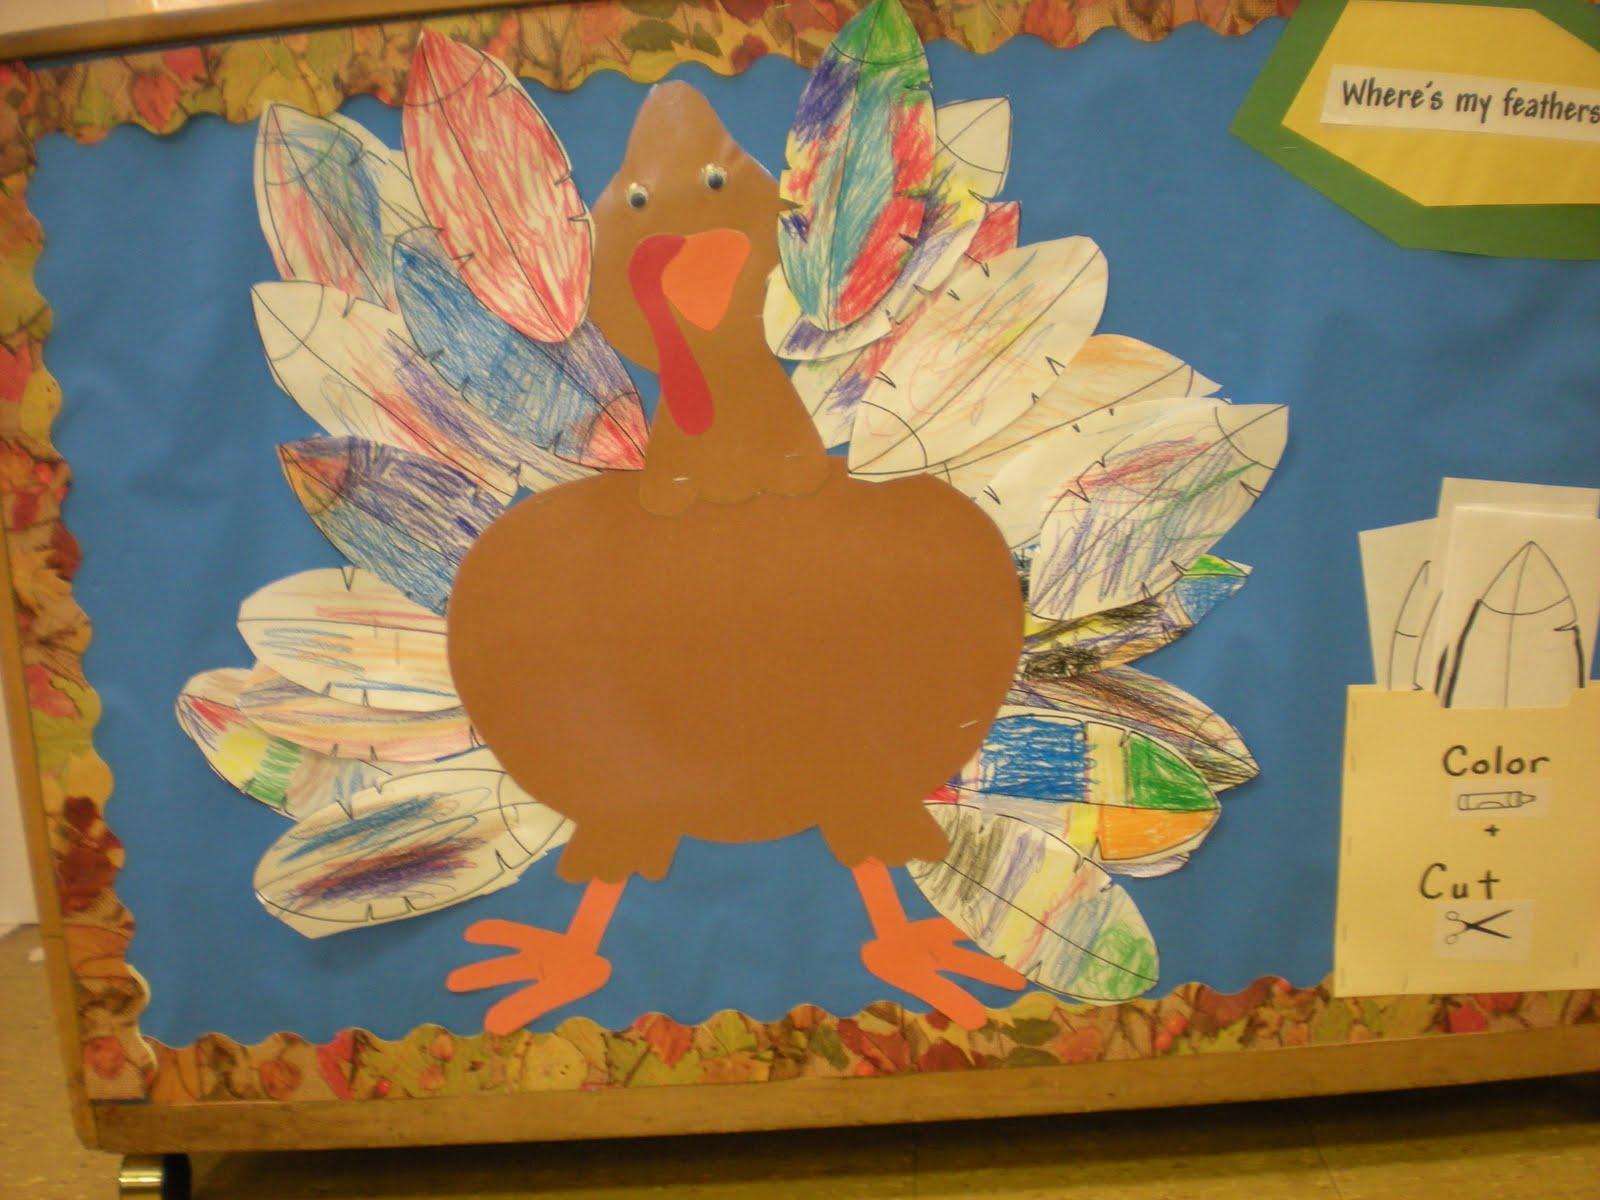 Easter bulletin board ideas for preschoolers myideasbedroom com